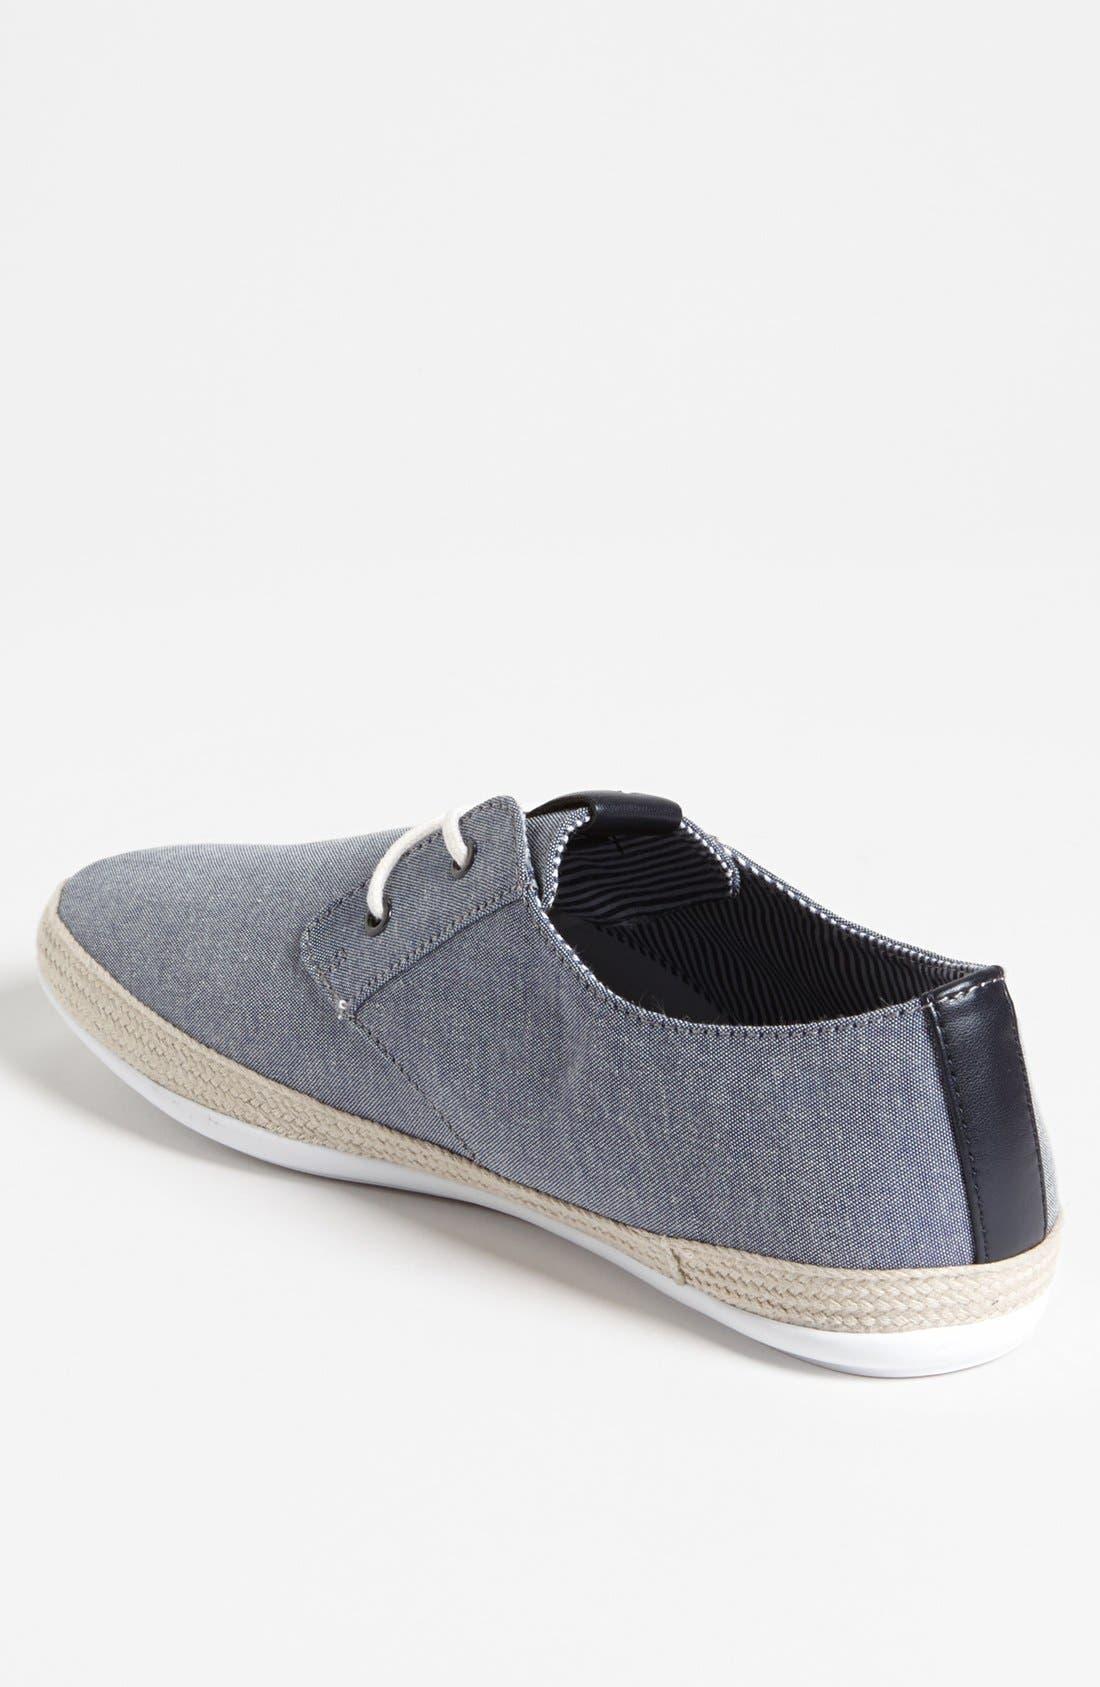 Alternate Image 2  - ALDO 'Stein' Sneaker